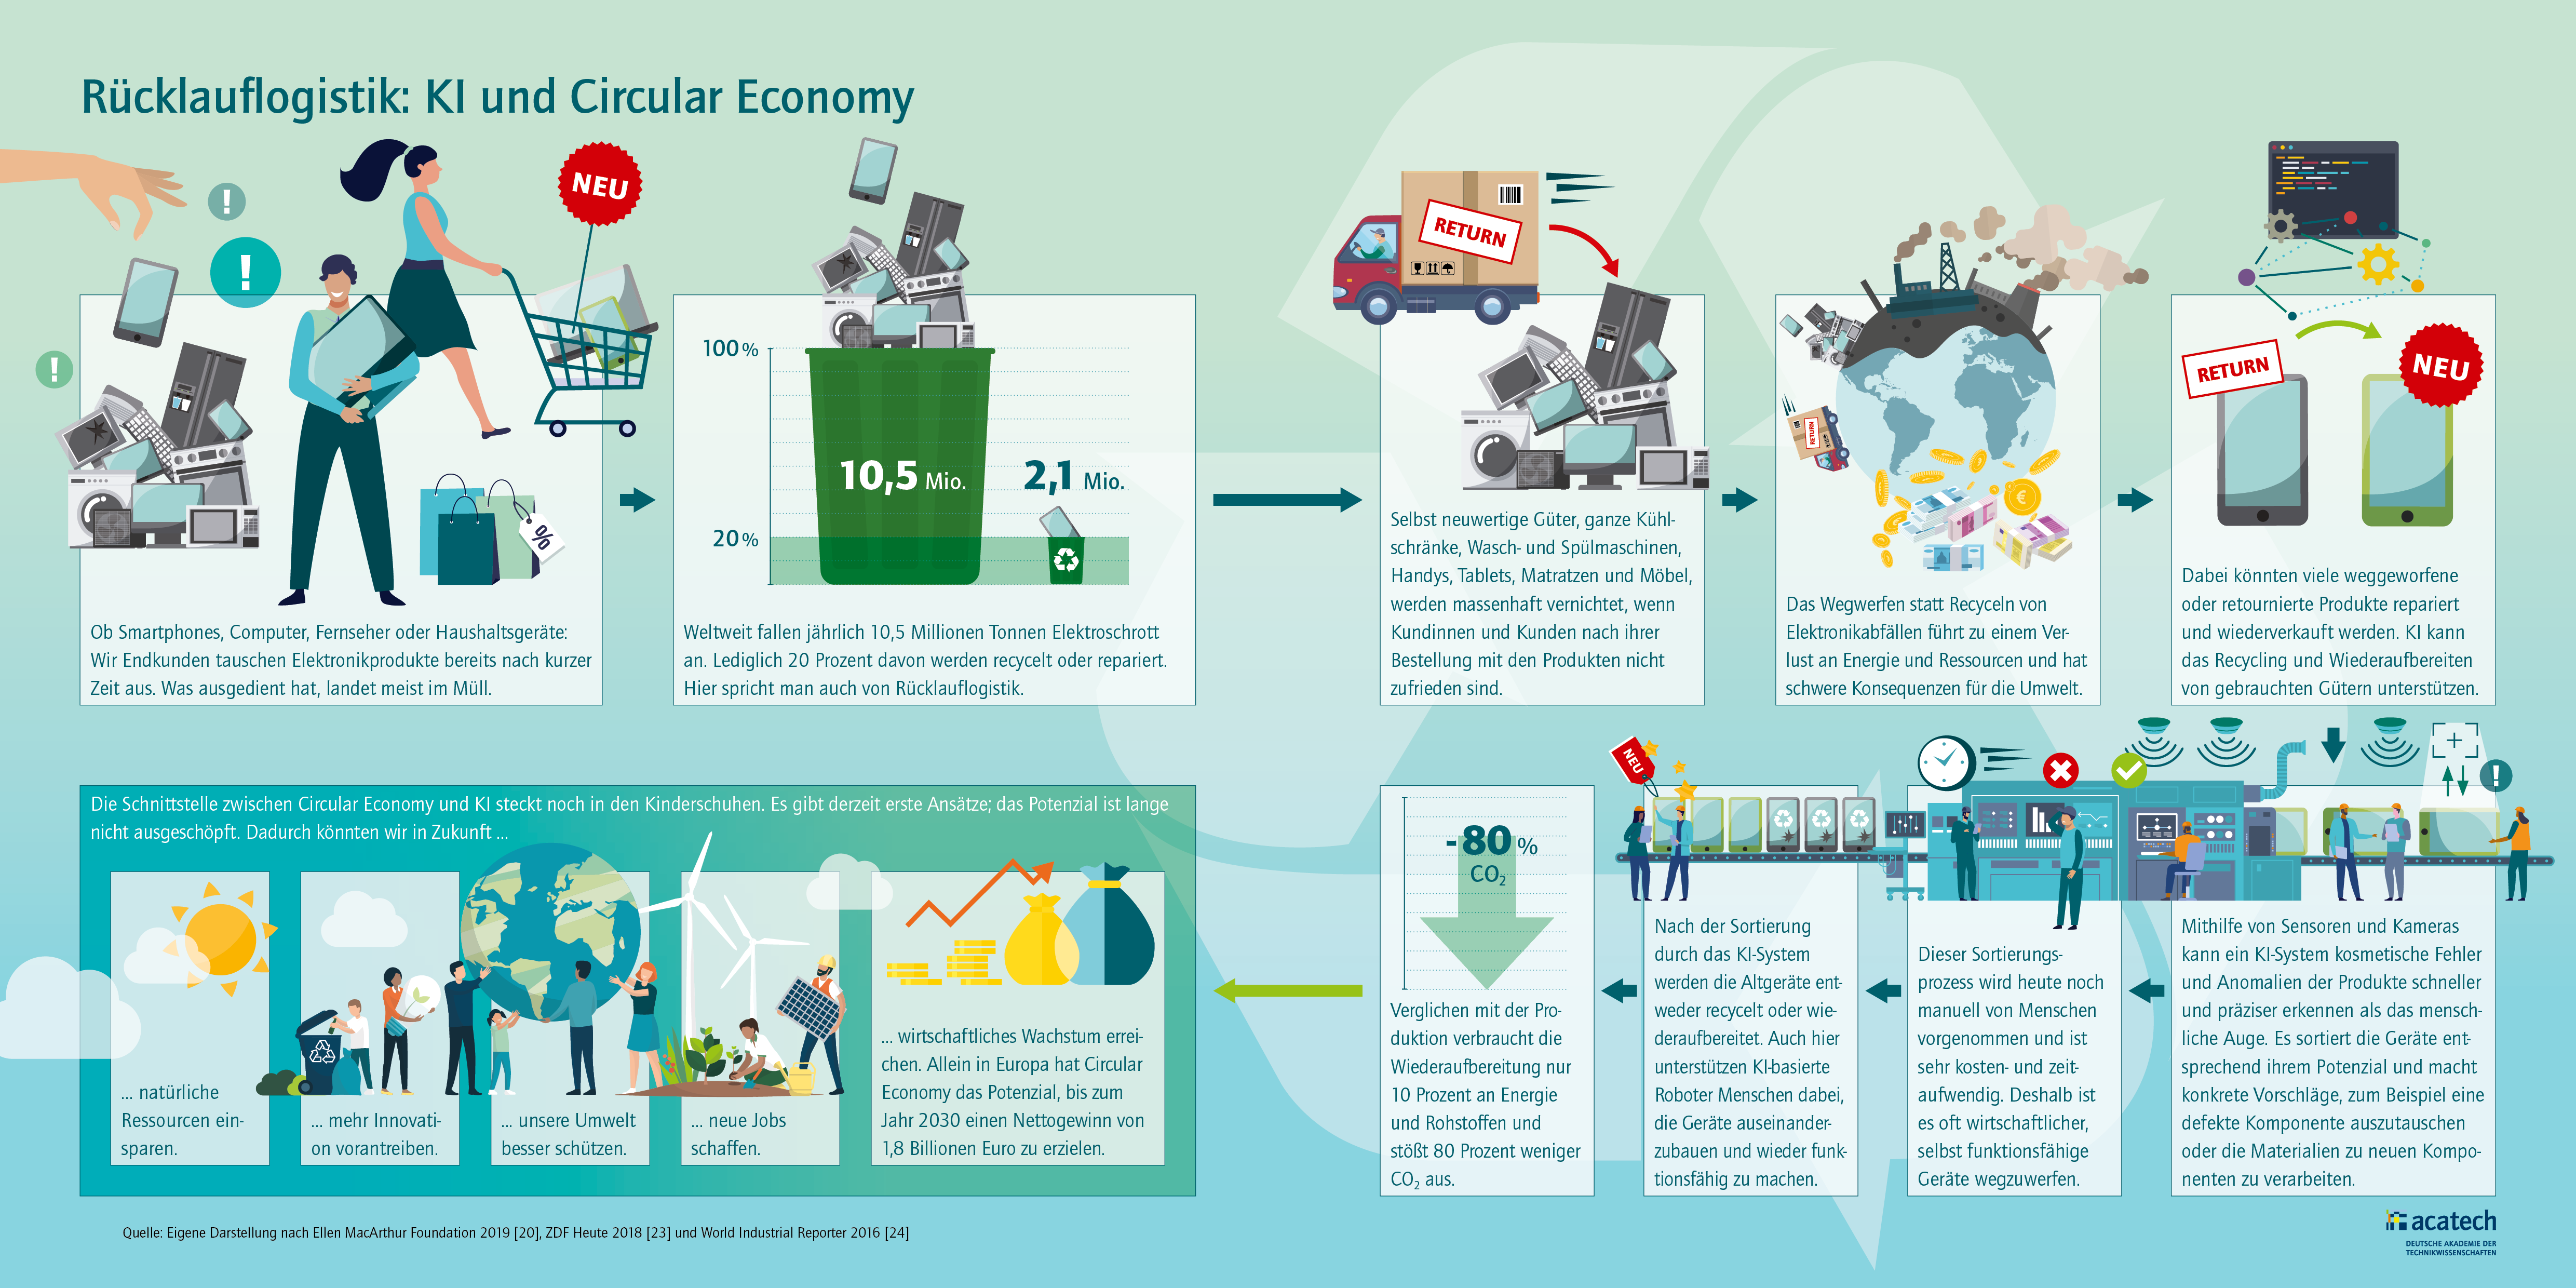 Grafik Funktionsweise der Rücklauflogistik: KI und Circular Economy